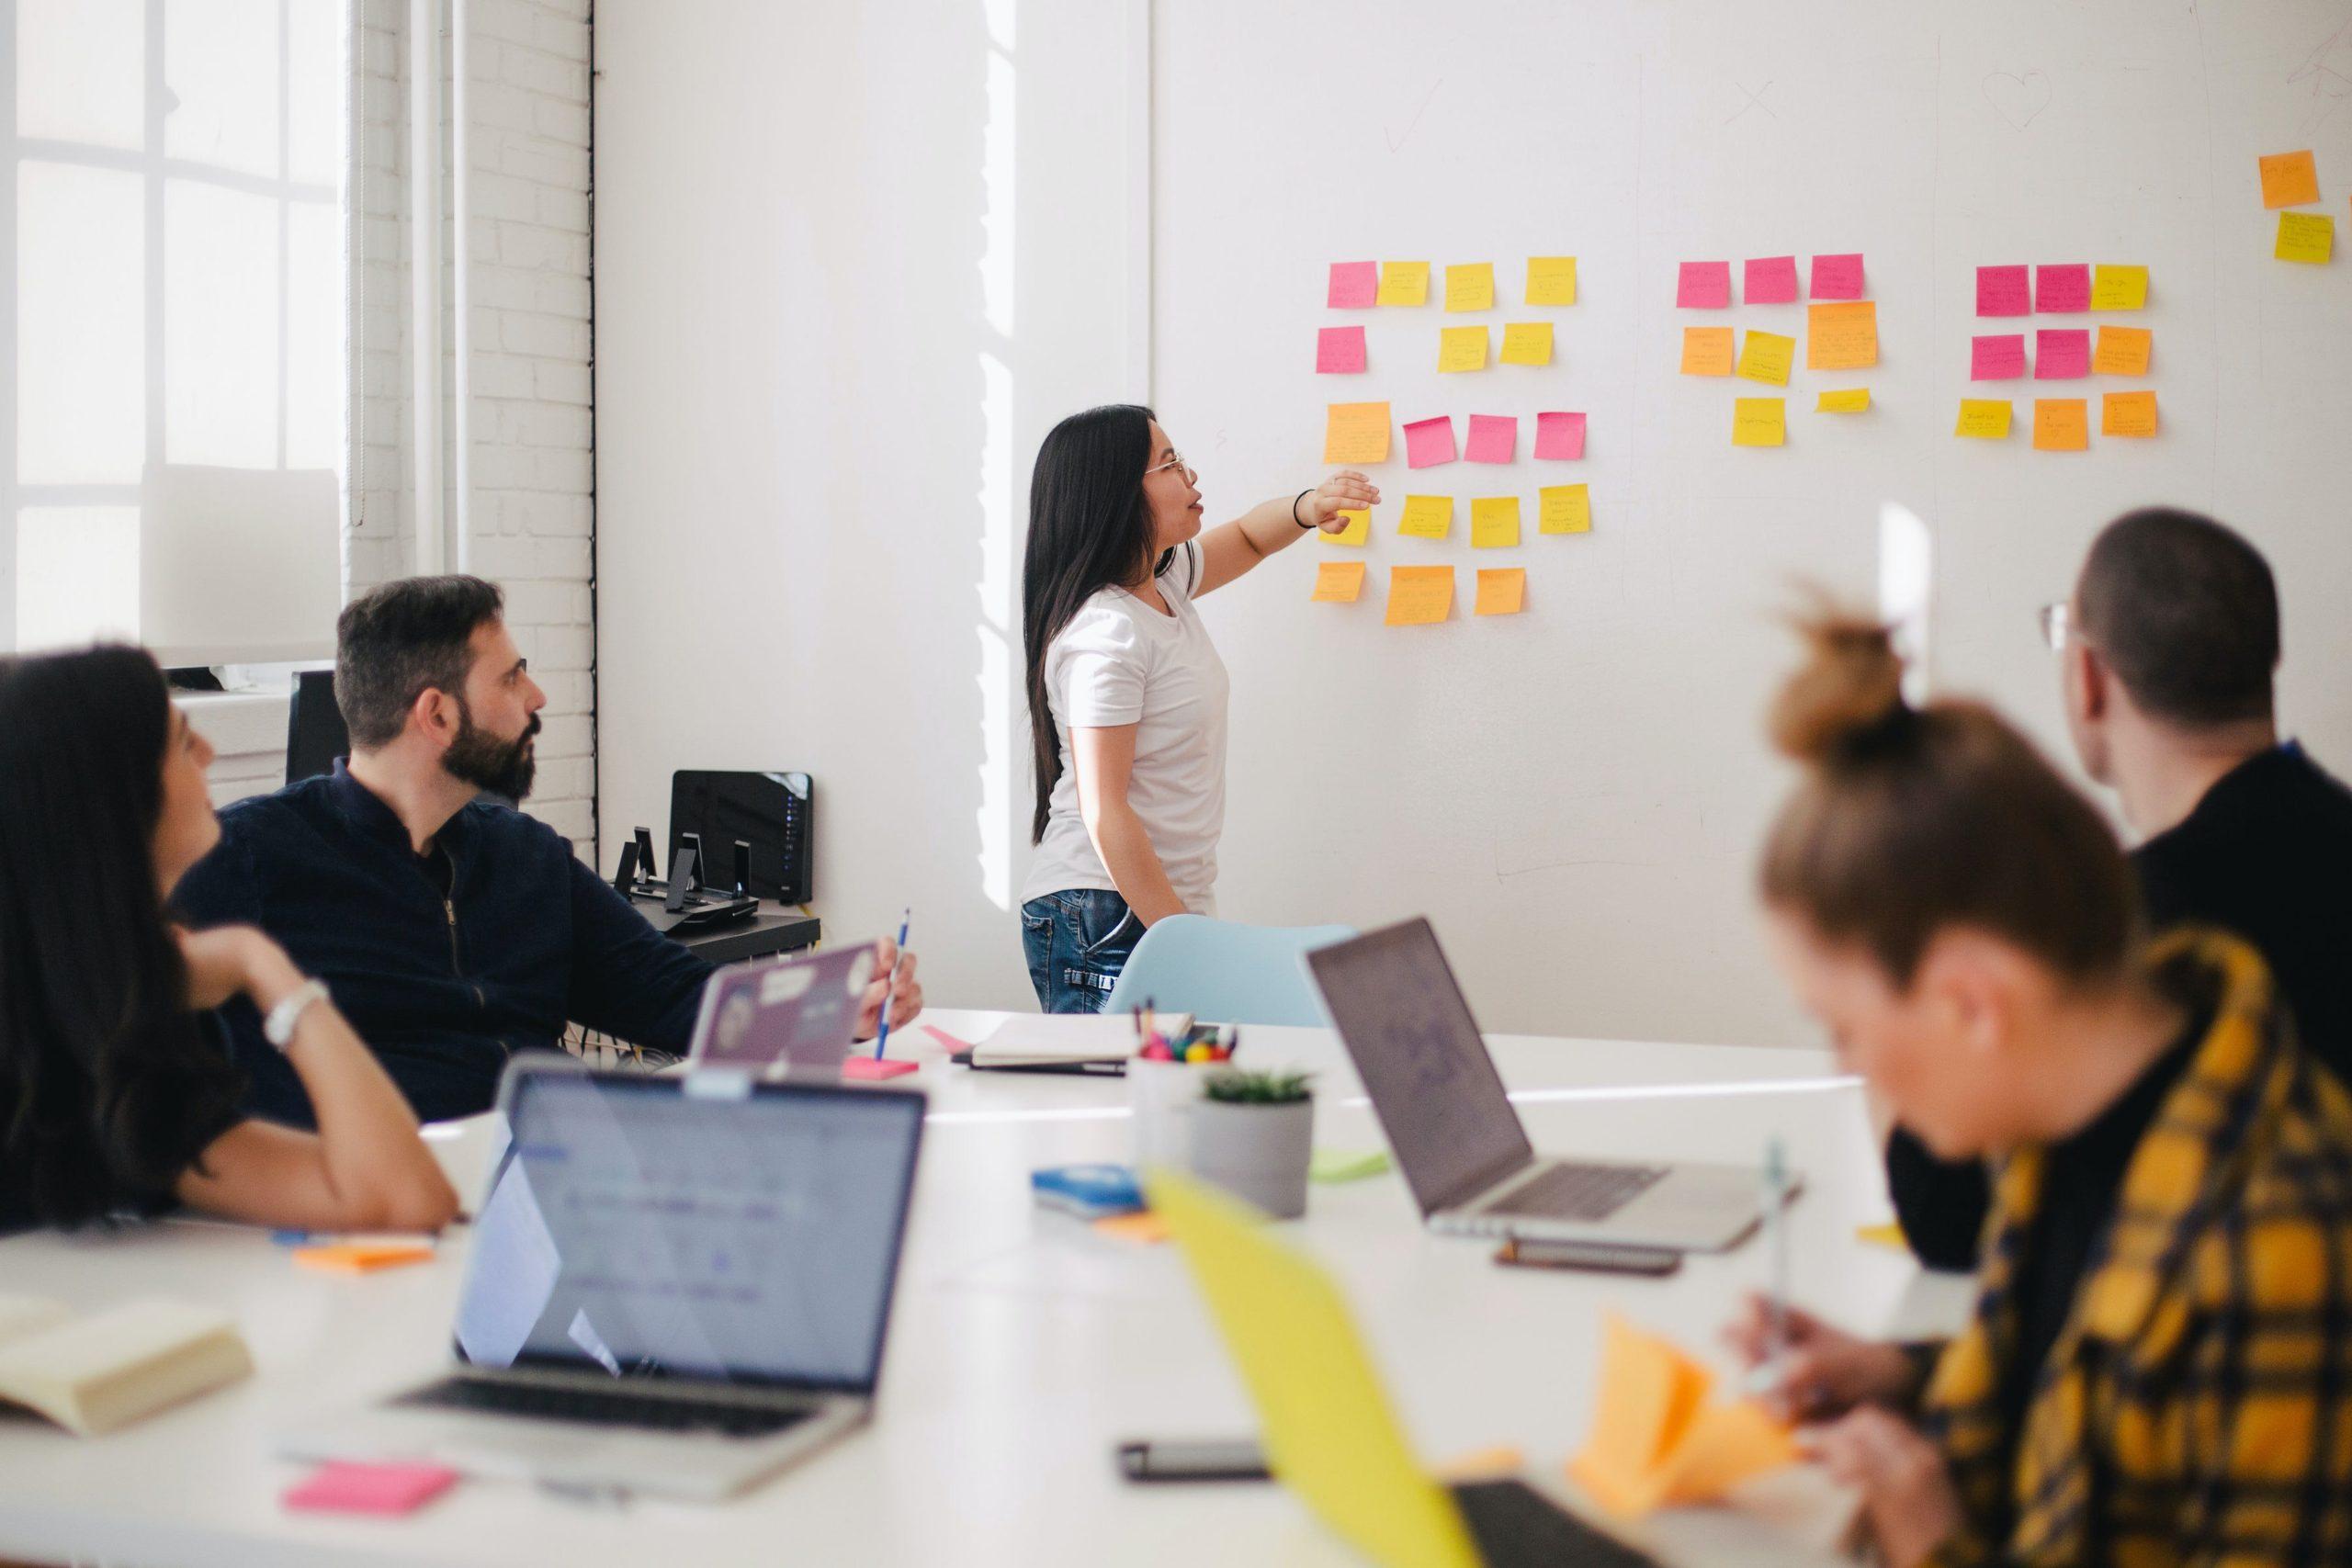 Employee Workplace Wellbeing